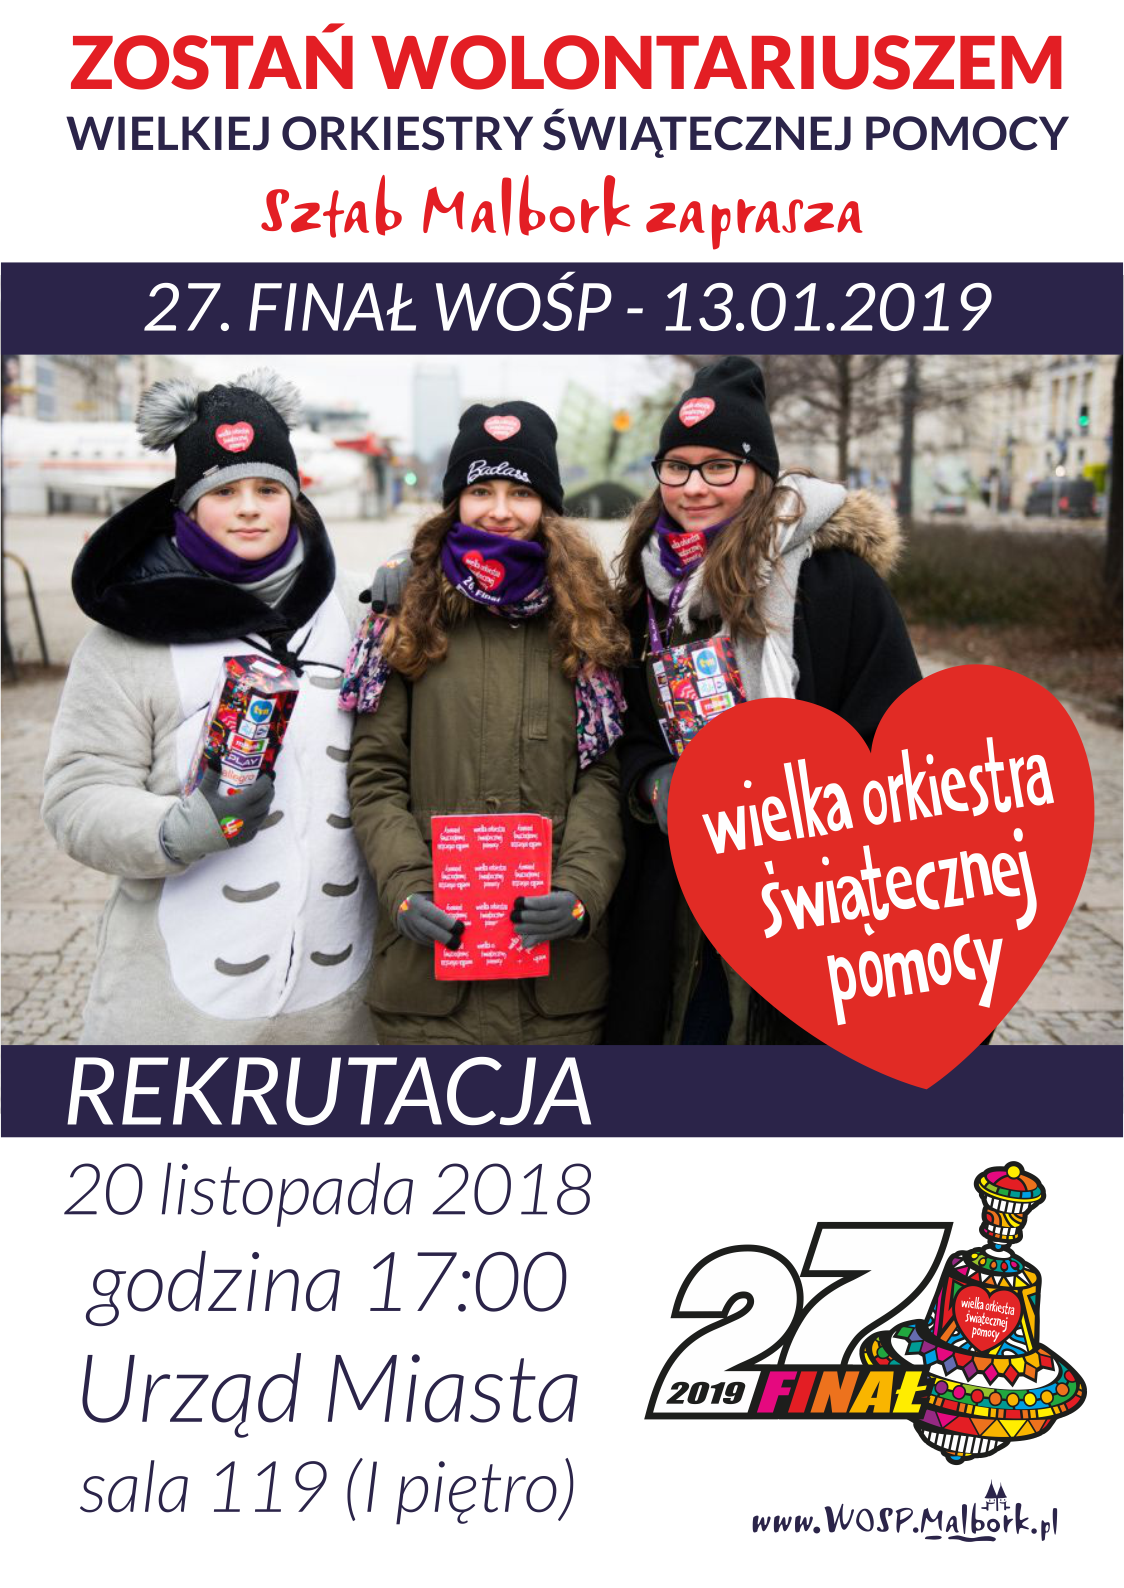 http://m.82-200.pl/2018/11/orig/plakat-rekrutacja-3793.png